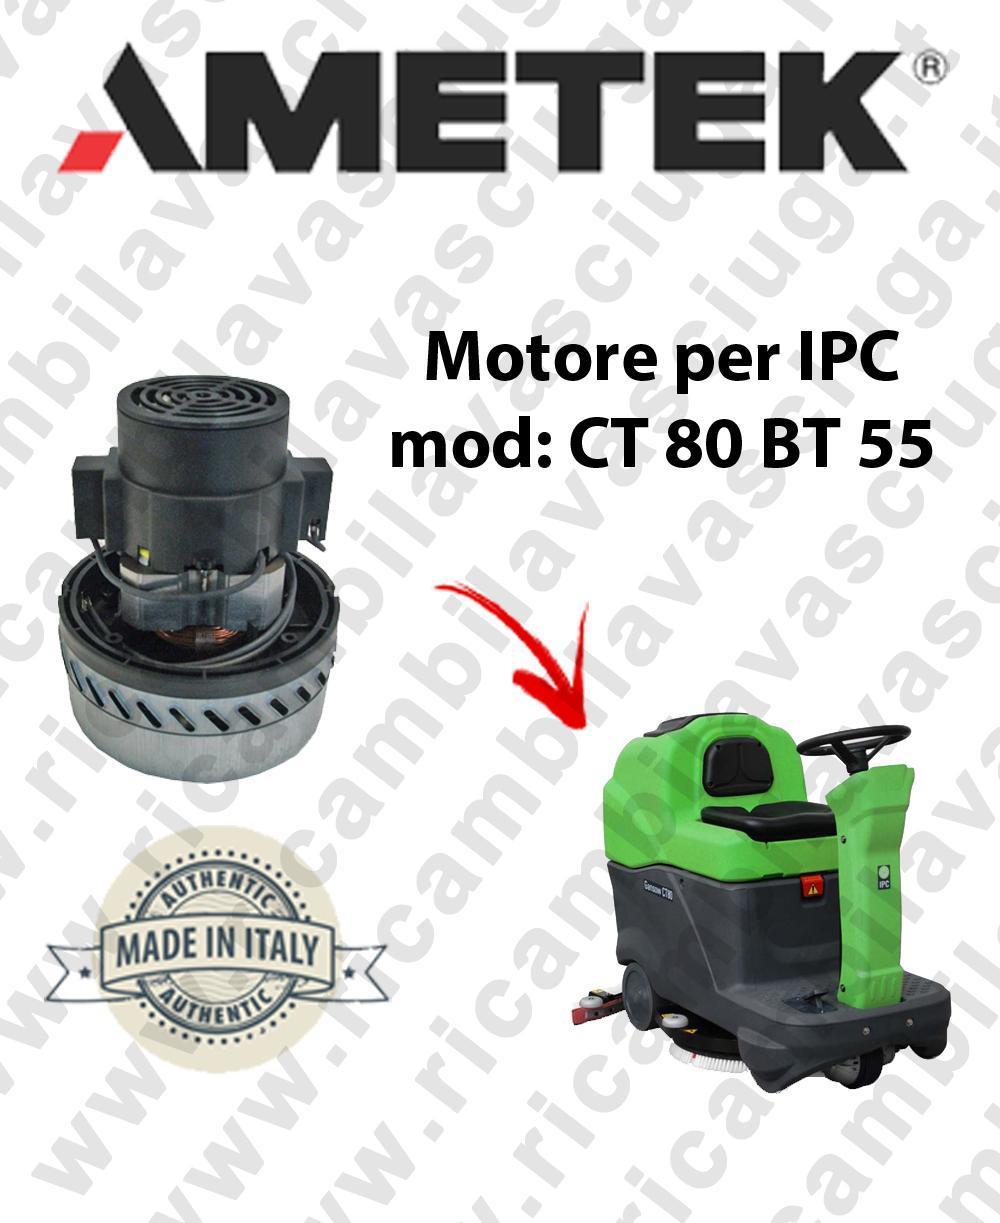 CT 80 BT 55 Saugmotor AMETEK für scheuersaugmaschinen IPC